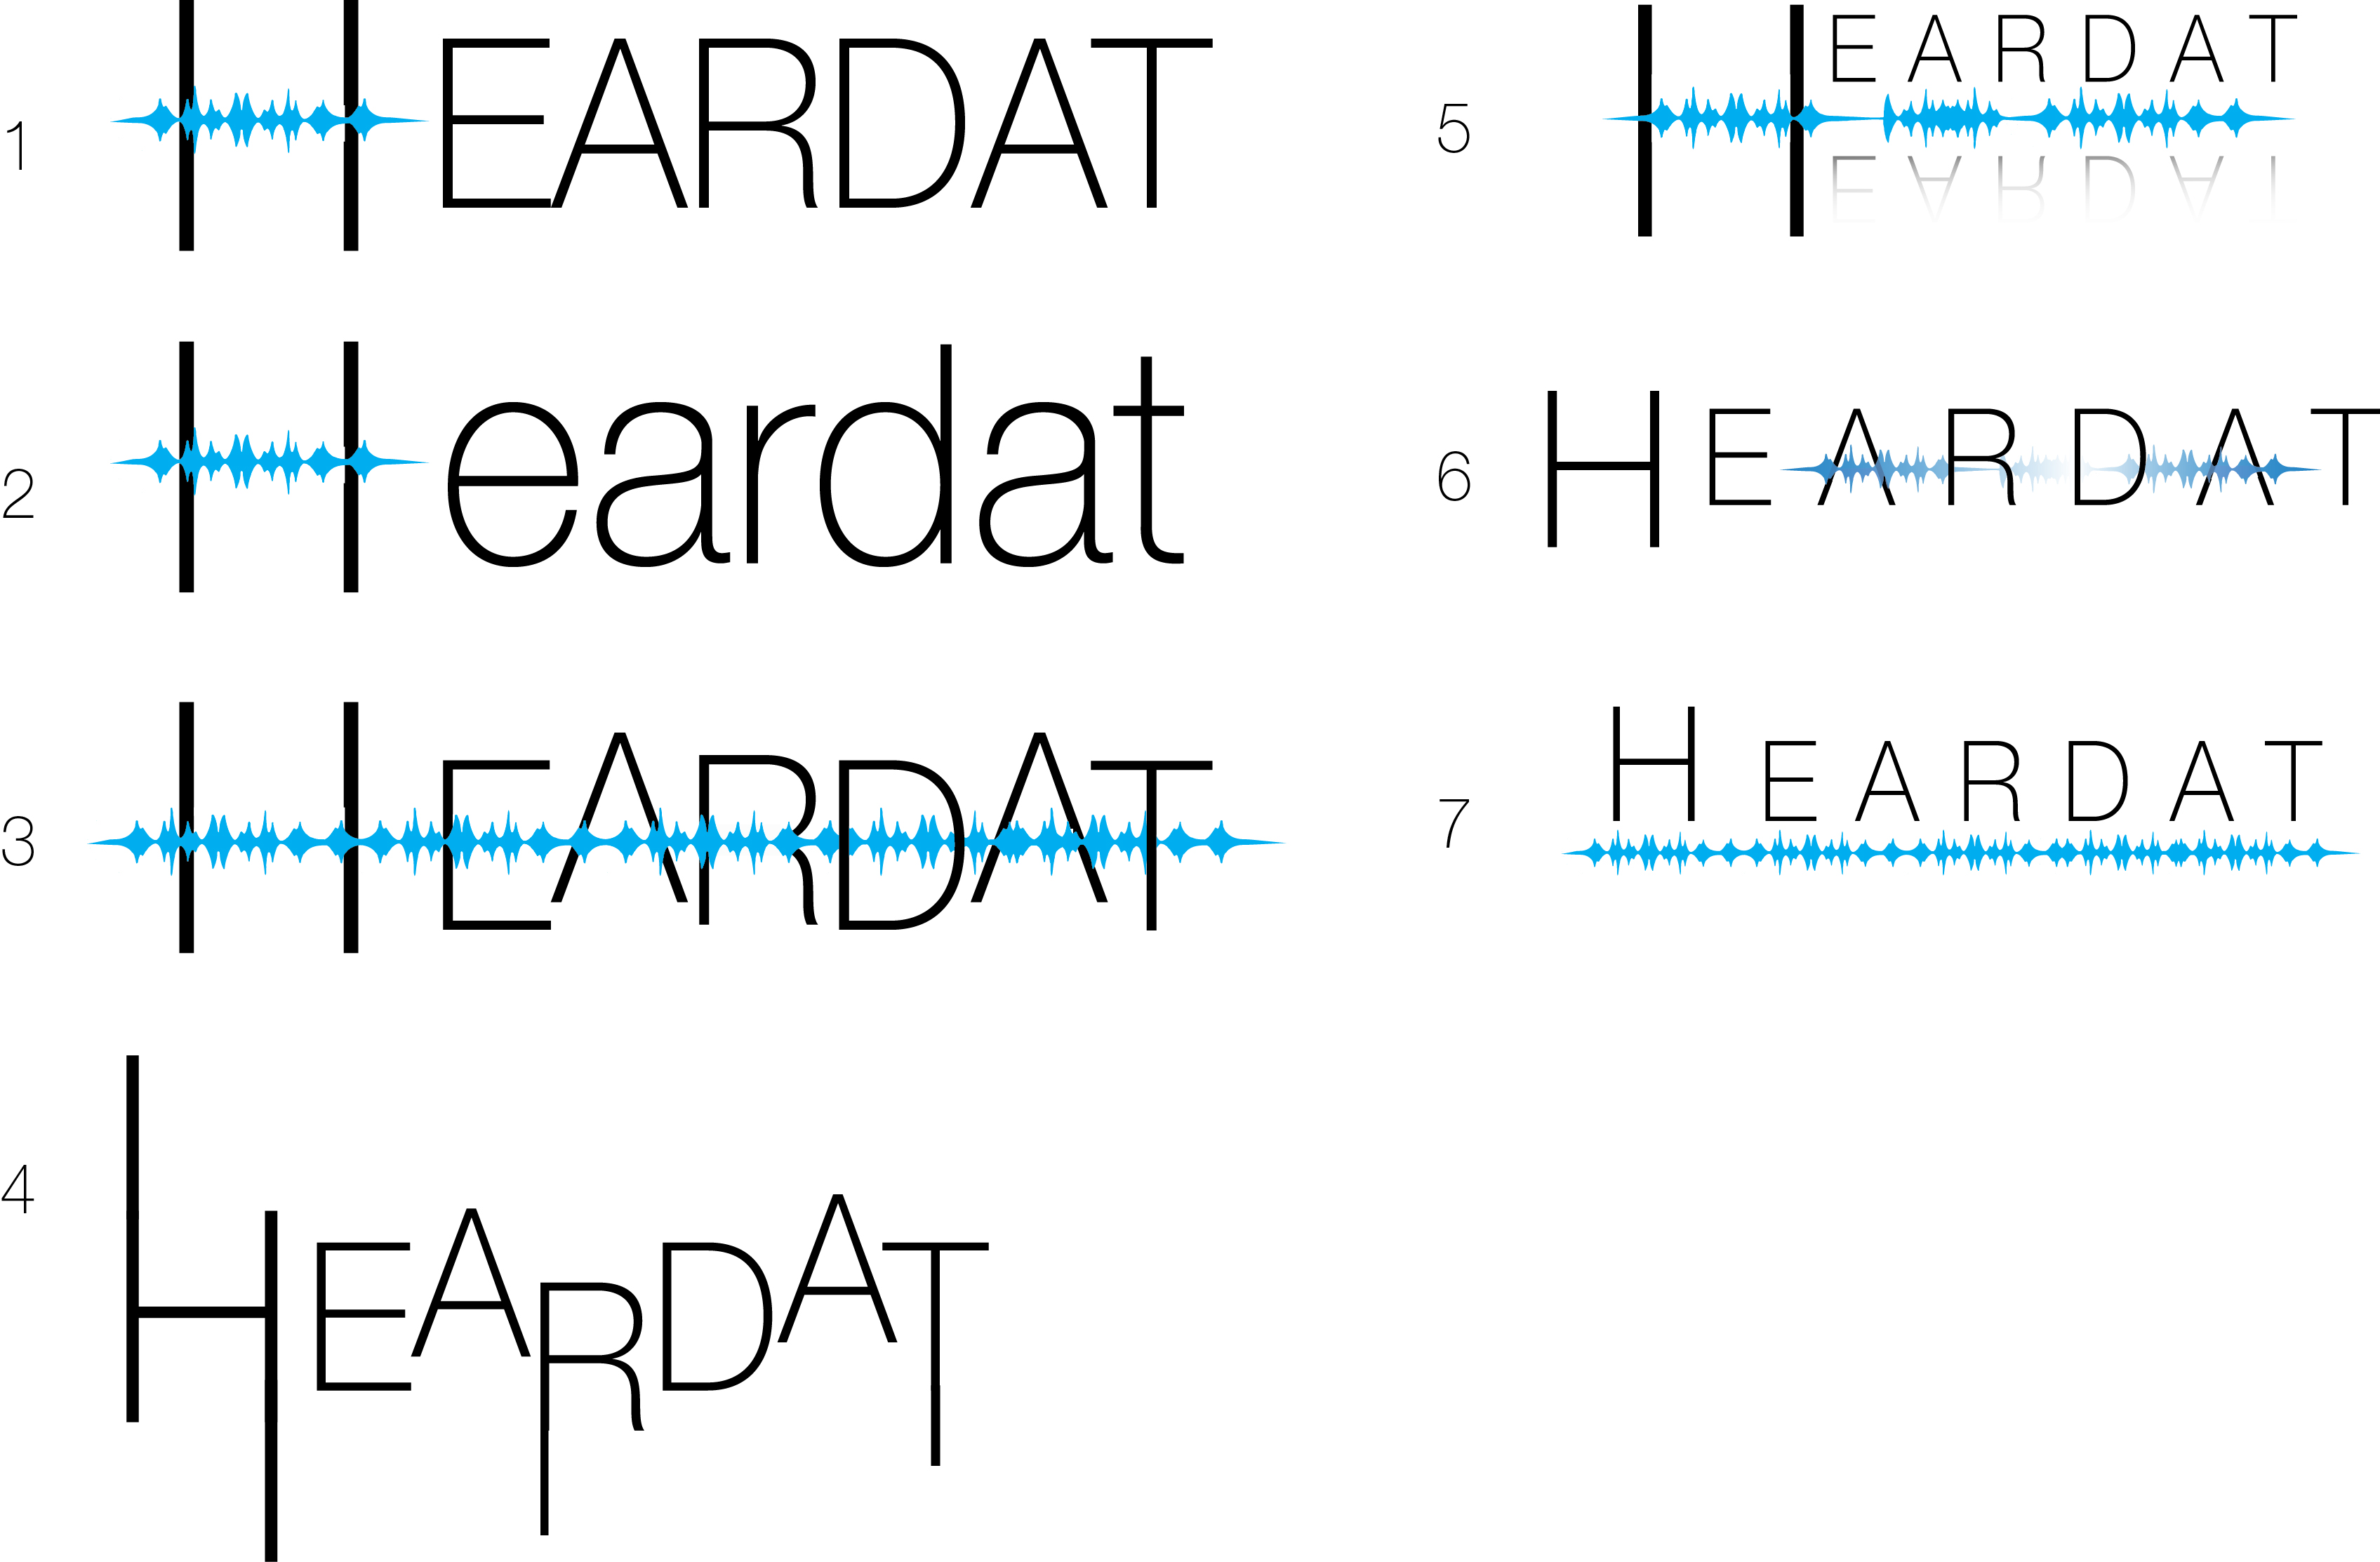 heardat logo opsies